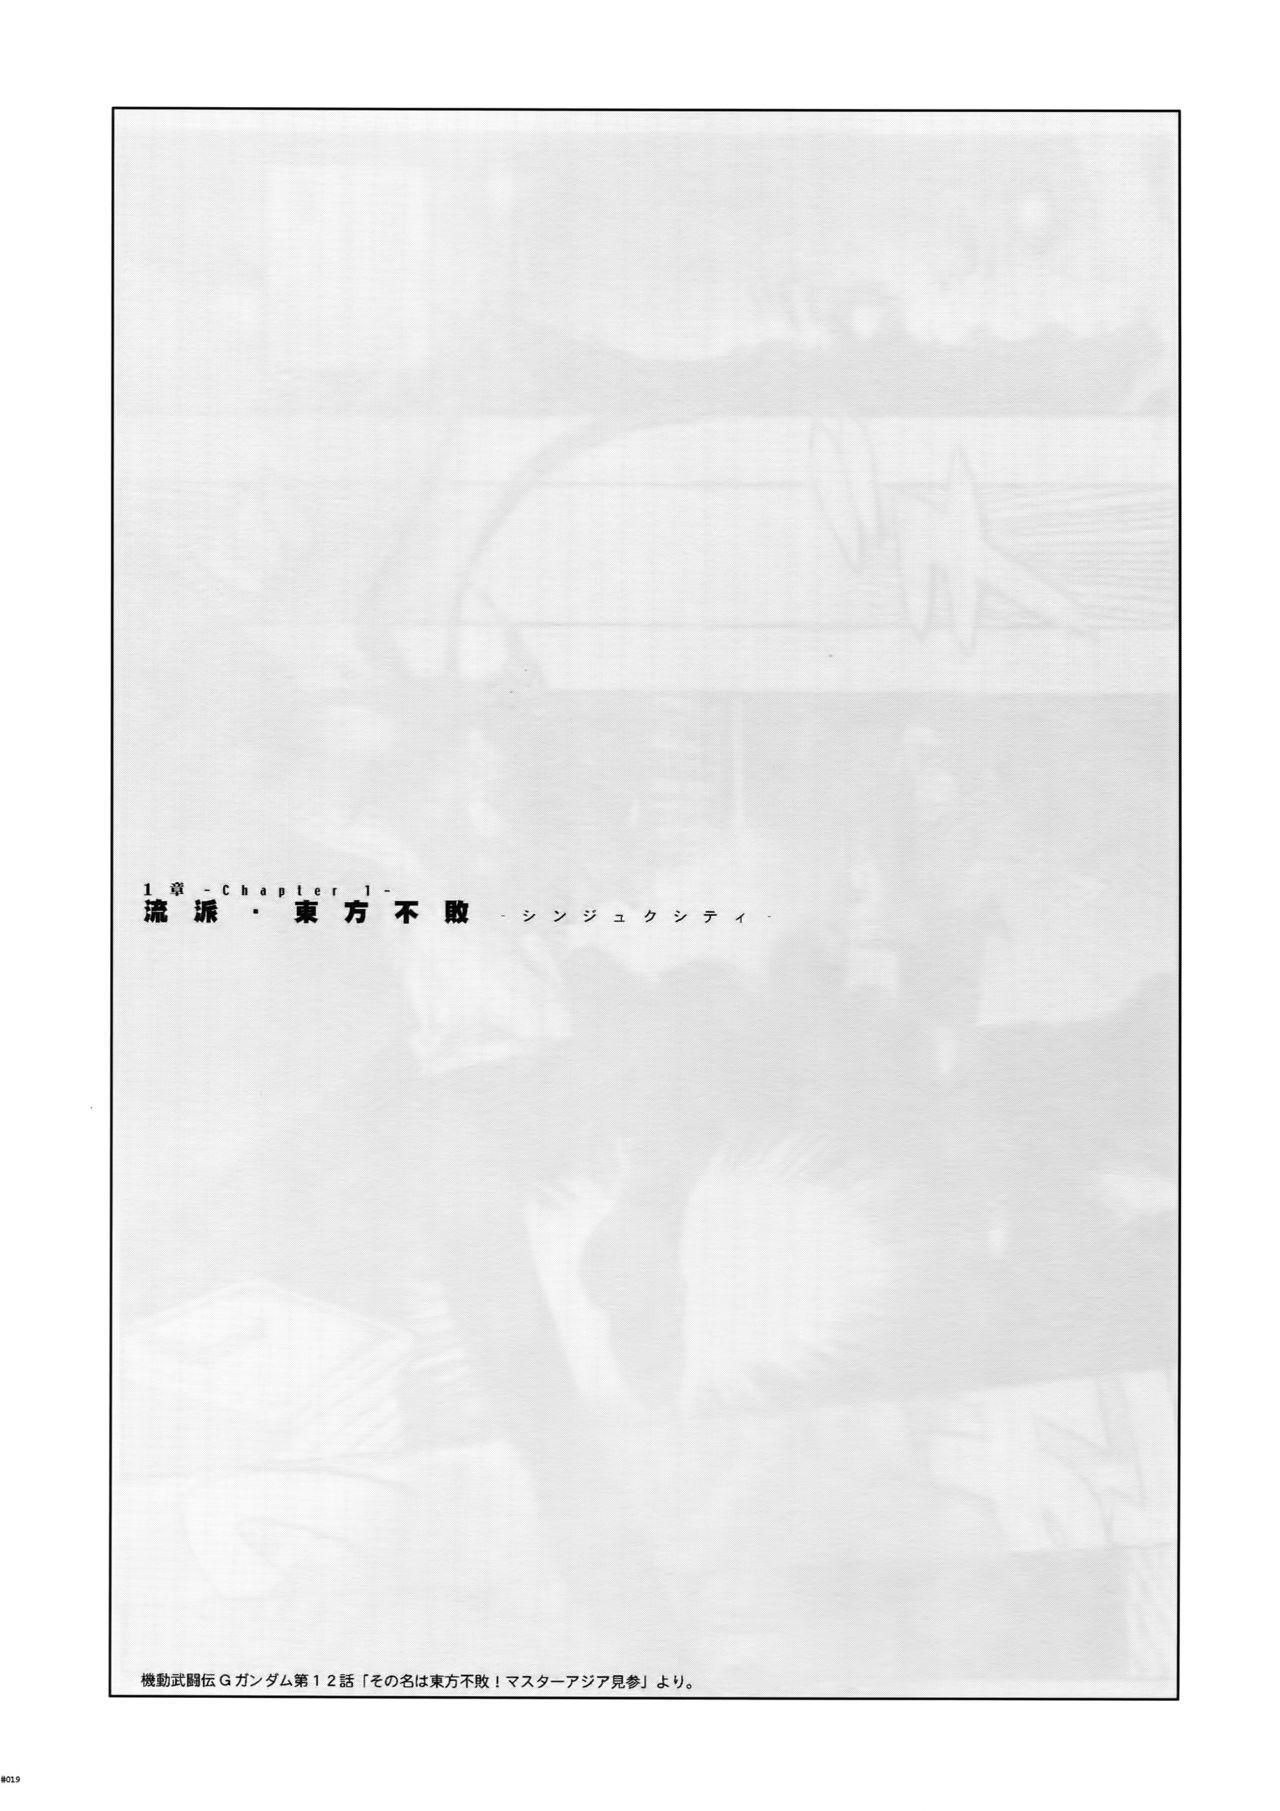 [Article 60 of Criminal Code (Shuhan)] G-gan Josei-Muke Sairoku-Shuu (G Gundam) 18